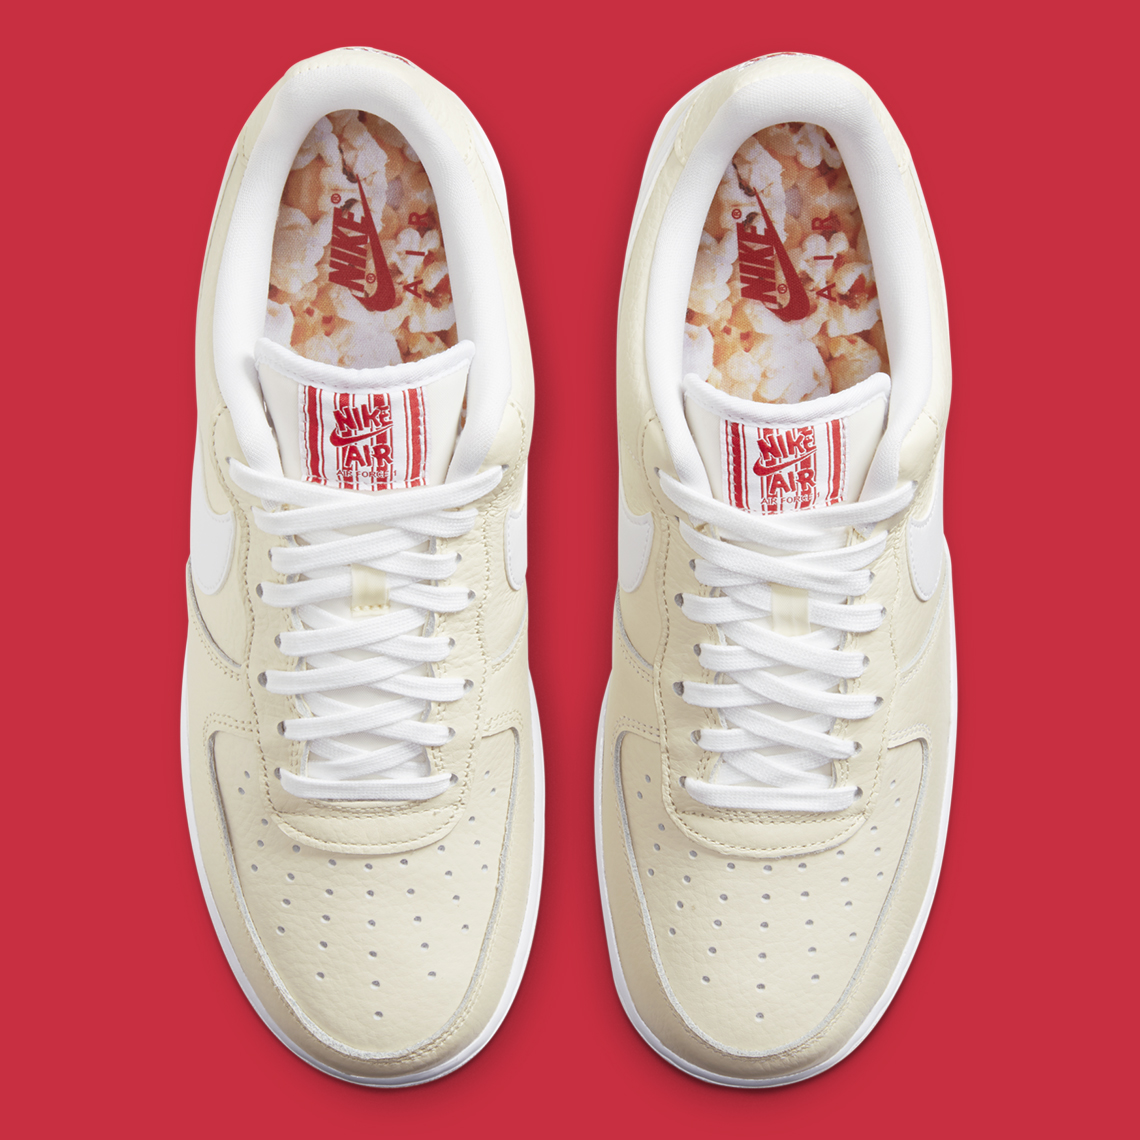 Nike-Air-Force-1-Popcorn-CW2919-100-8.jpg?w=1140